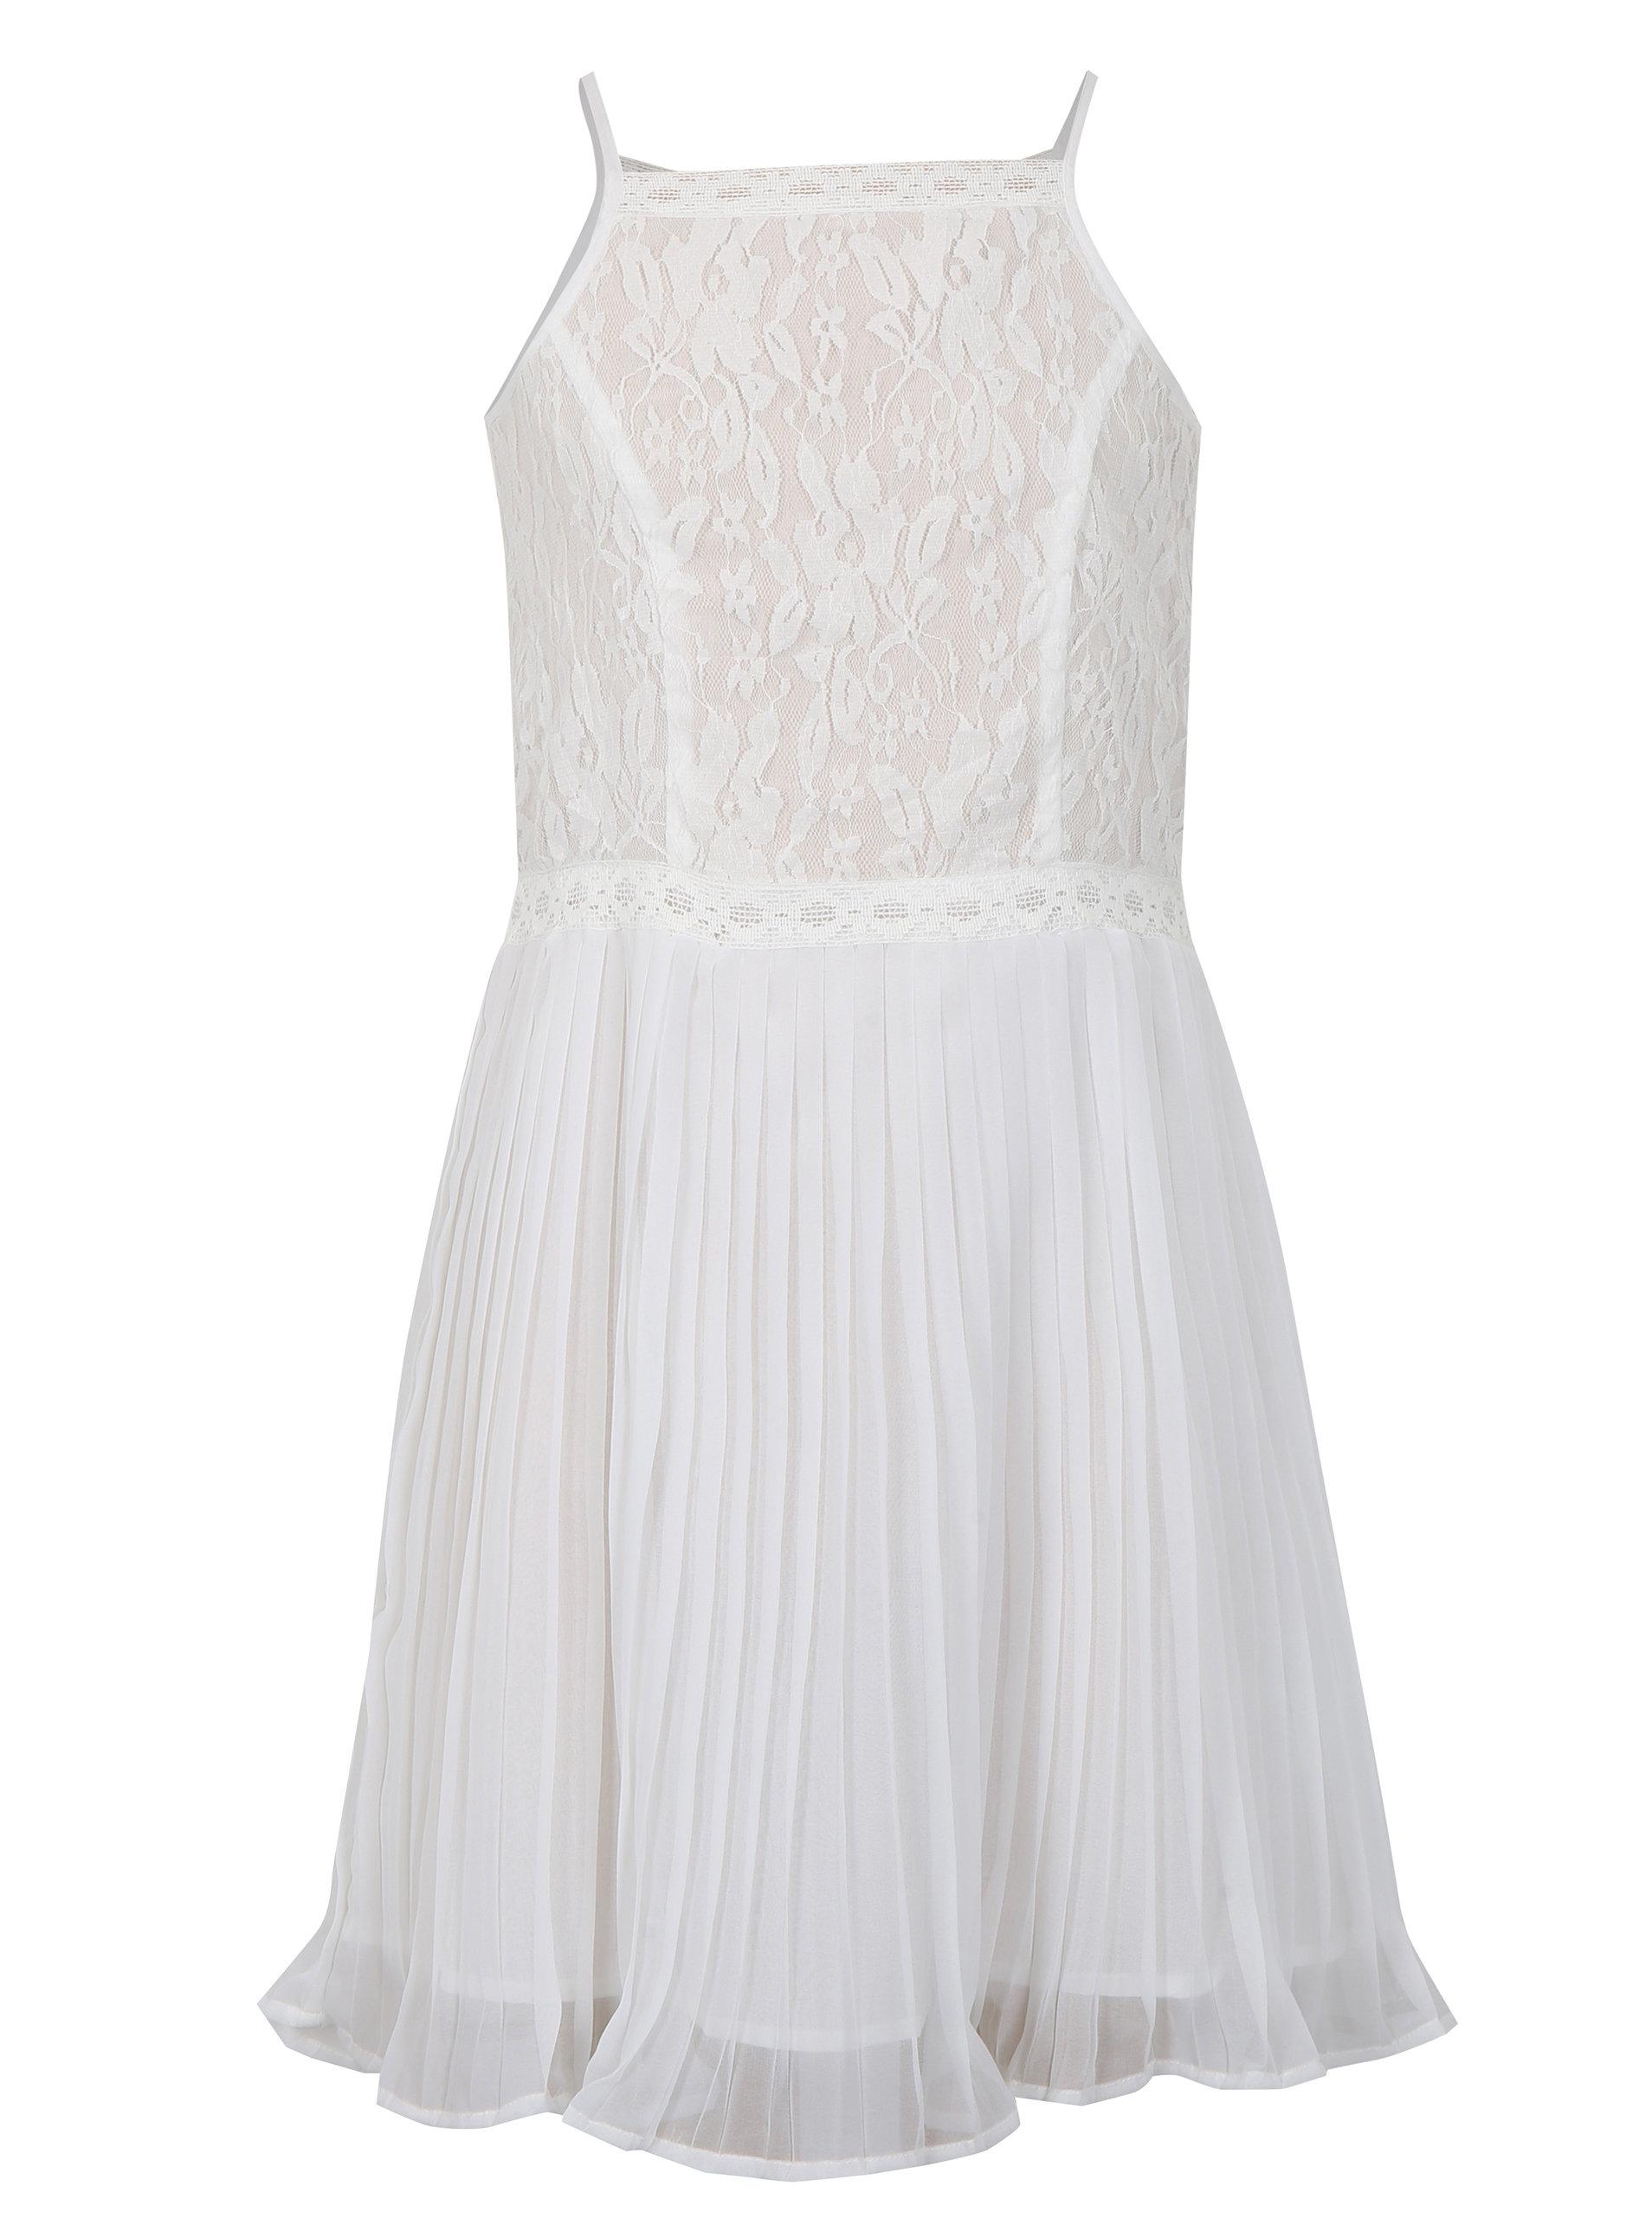 837752bc4518 Biele dievčenské šaty s čipkovaným topom Blue Seven ...